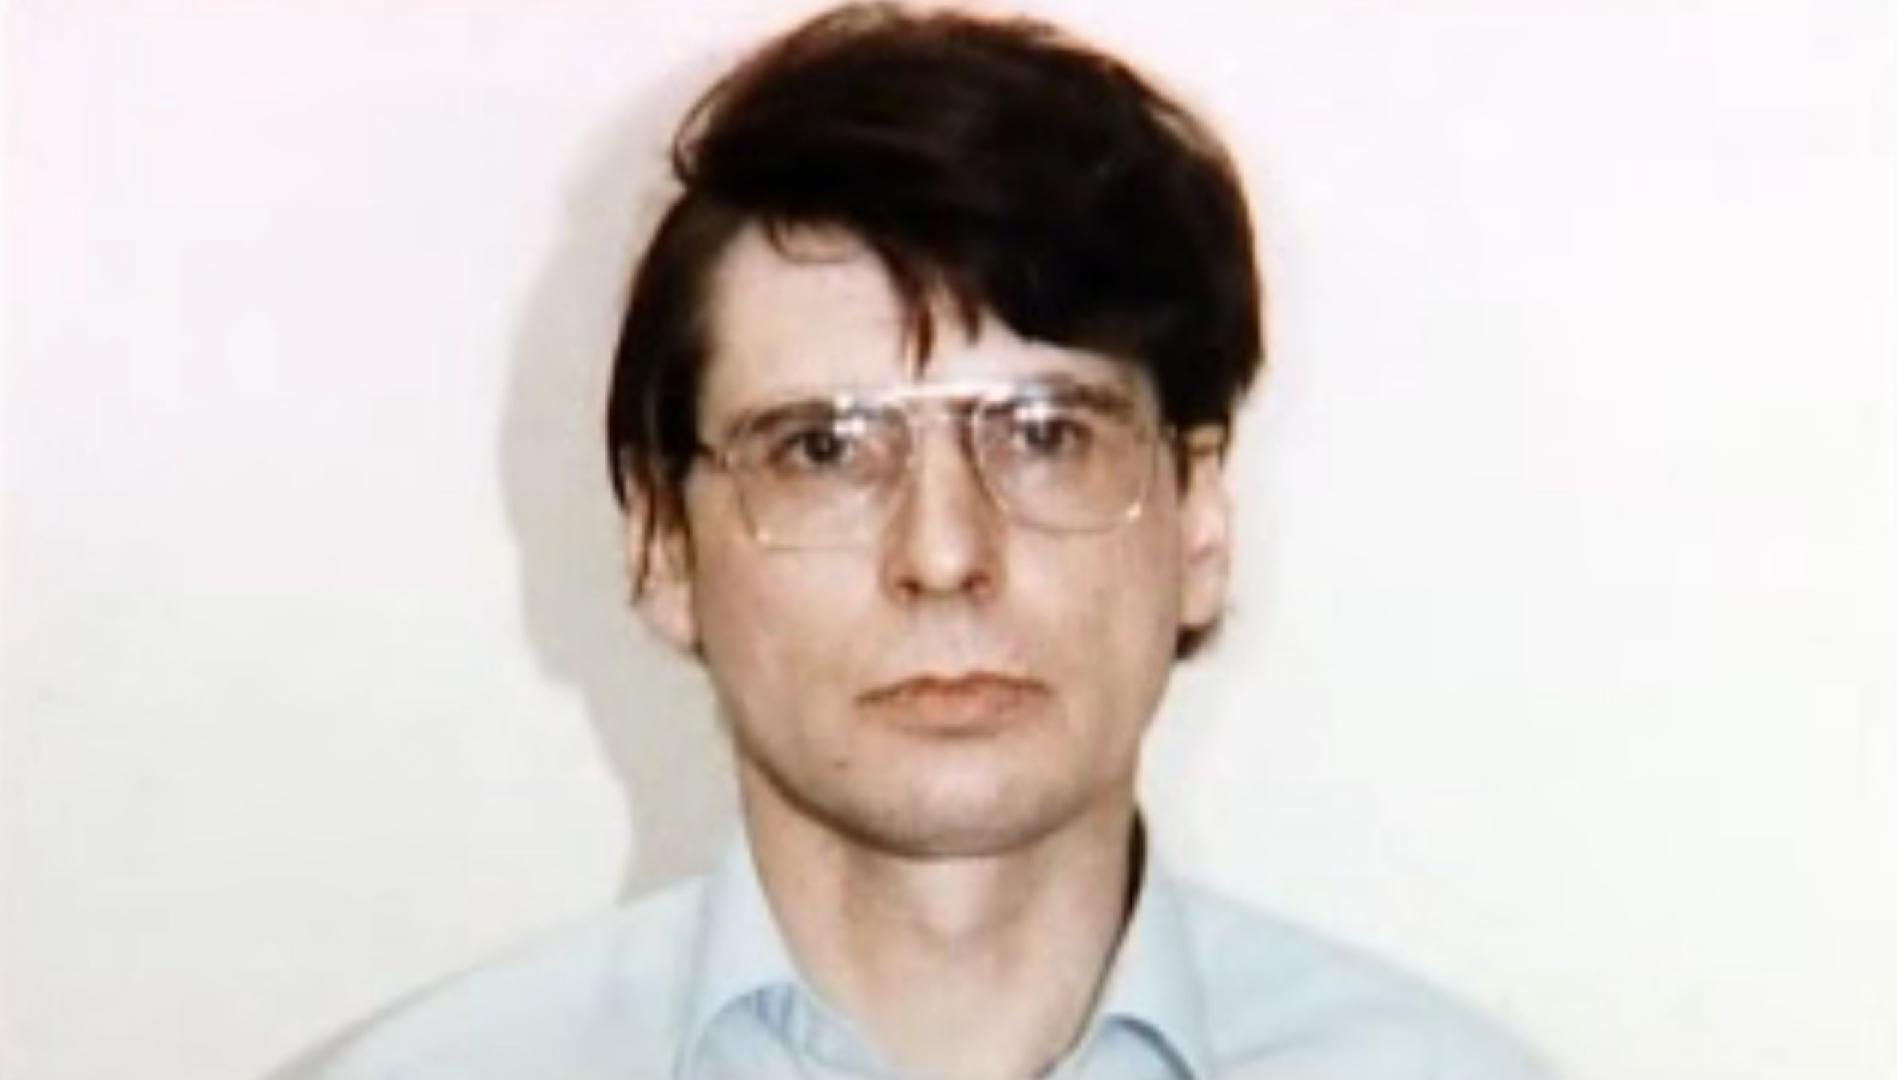 Dennis Nilsen 1. kép